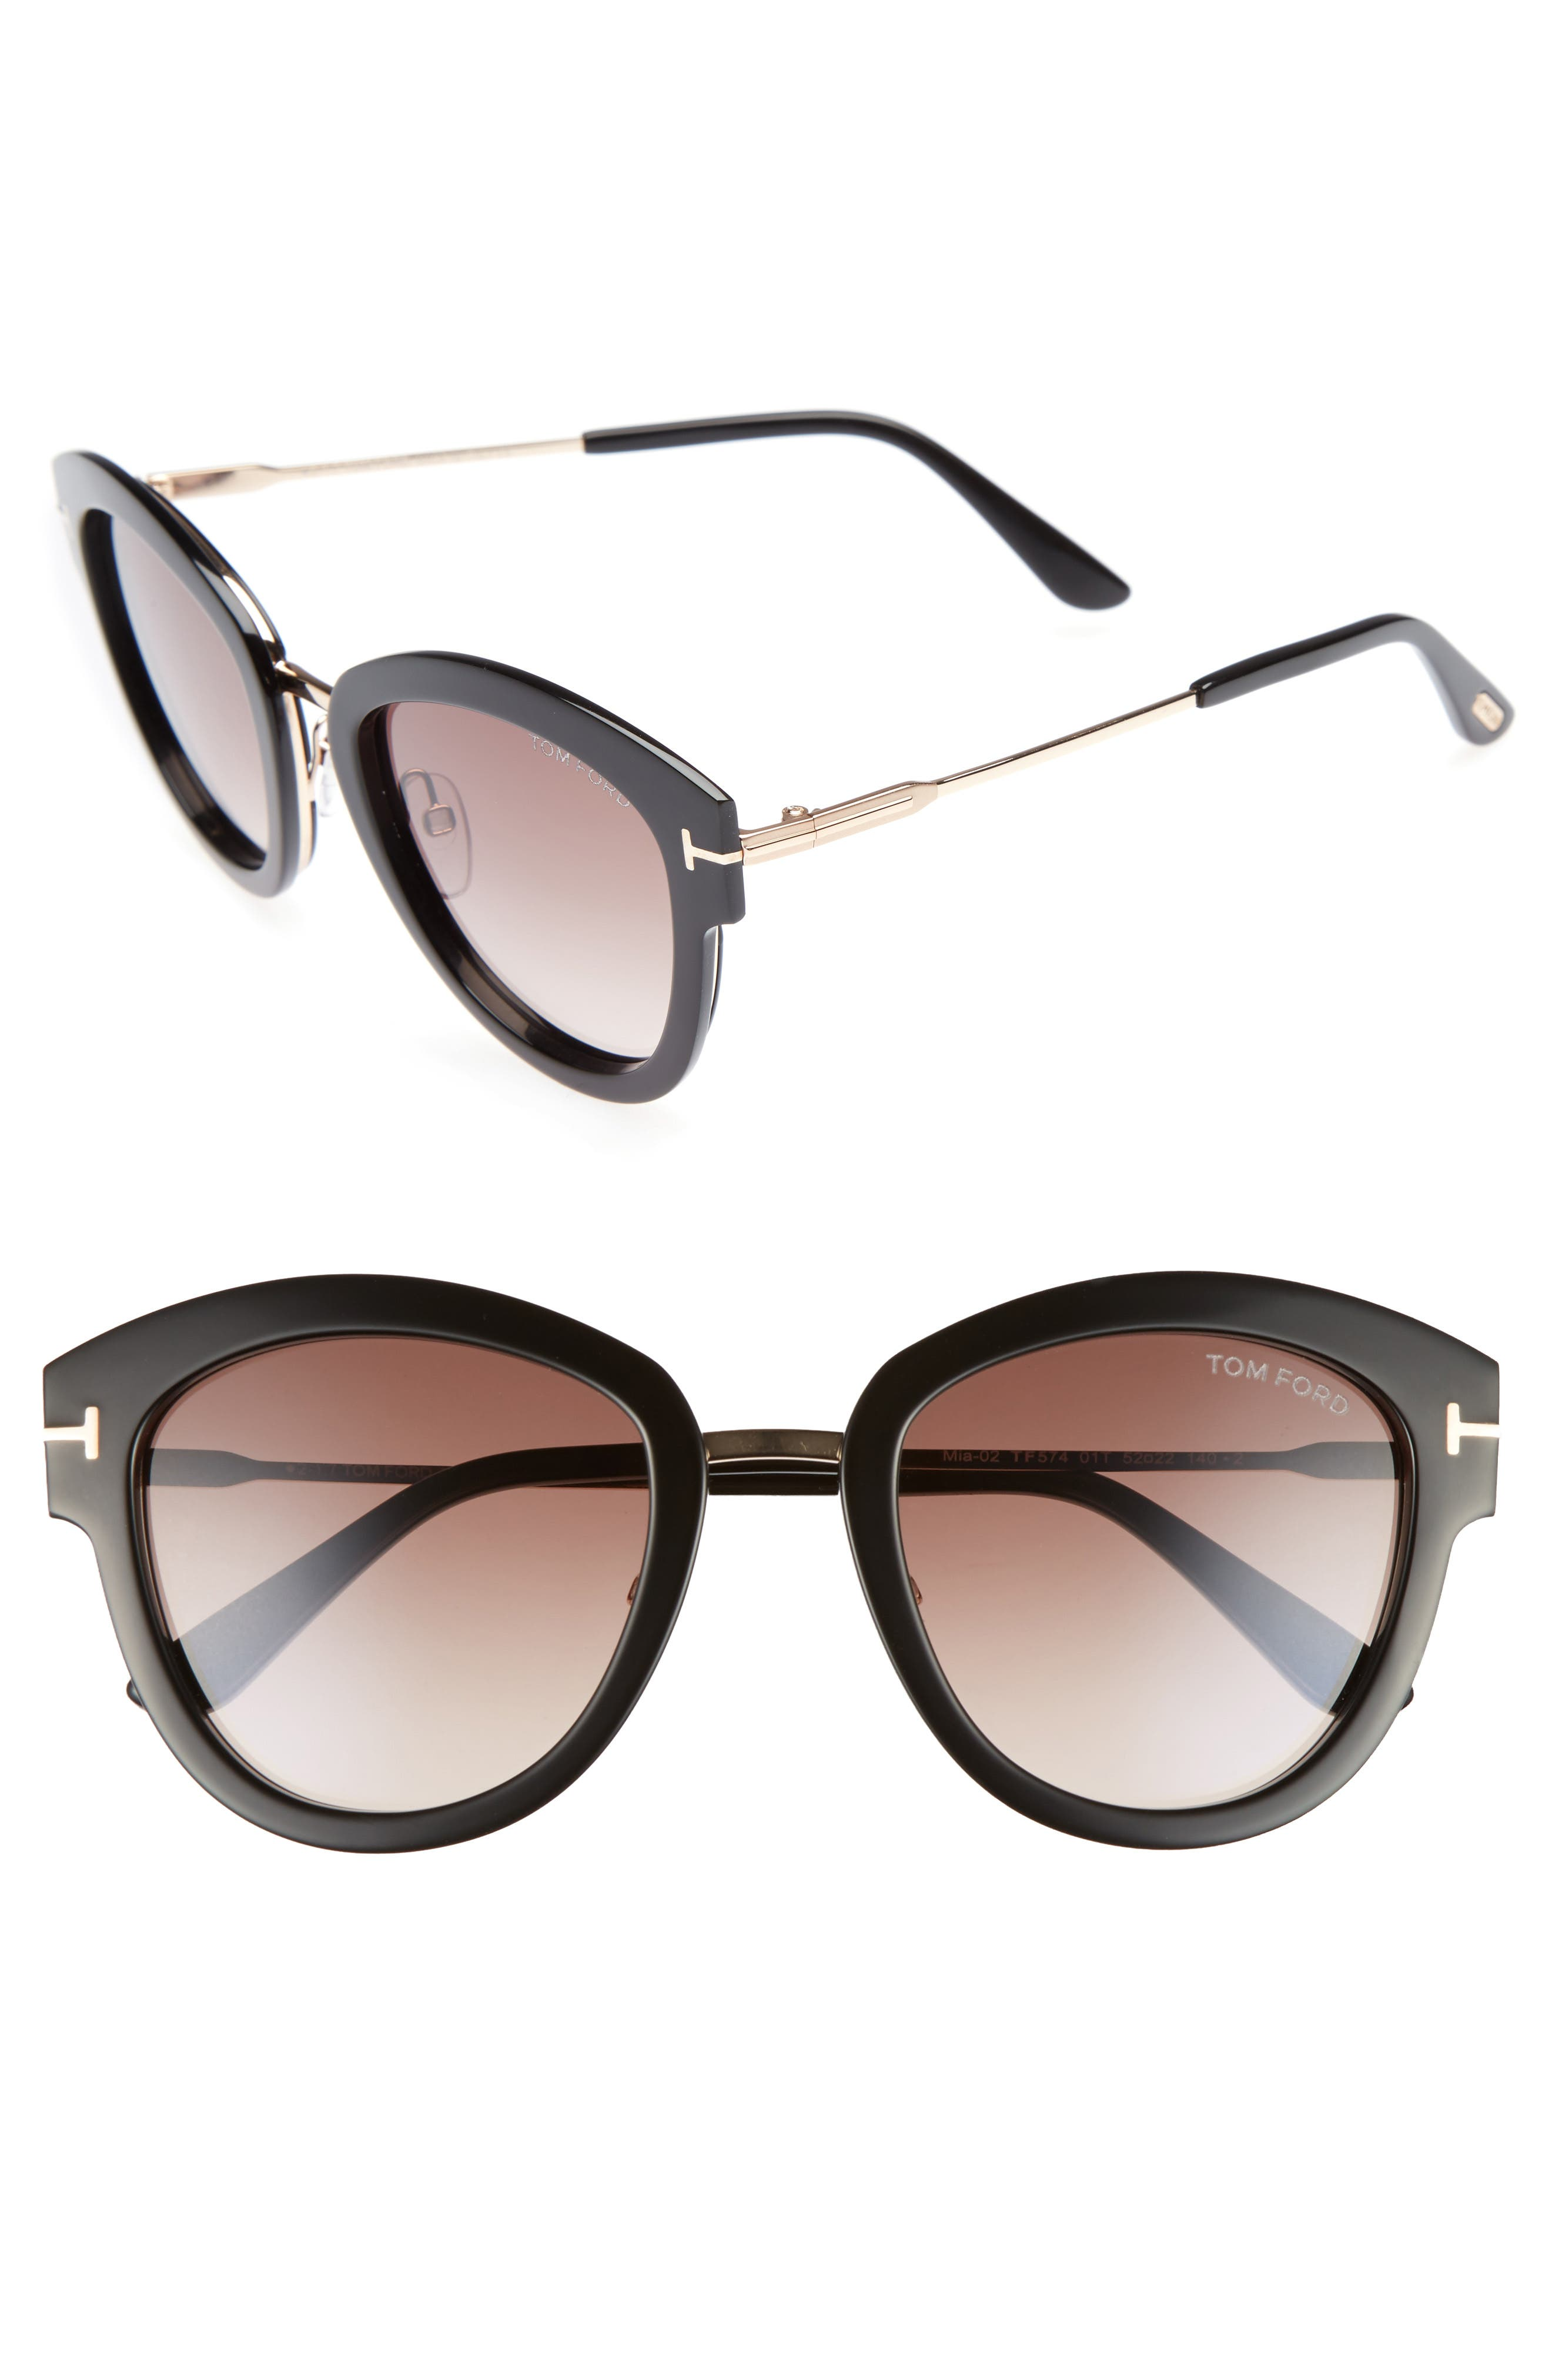 Mia 55mm Cat Eye Sunglasses,                         Main,                         color, BLACK ACETATE/ ROSE GOLD